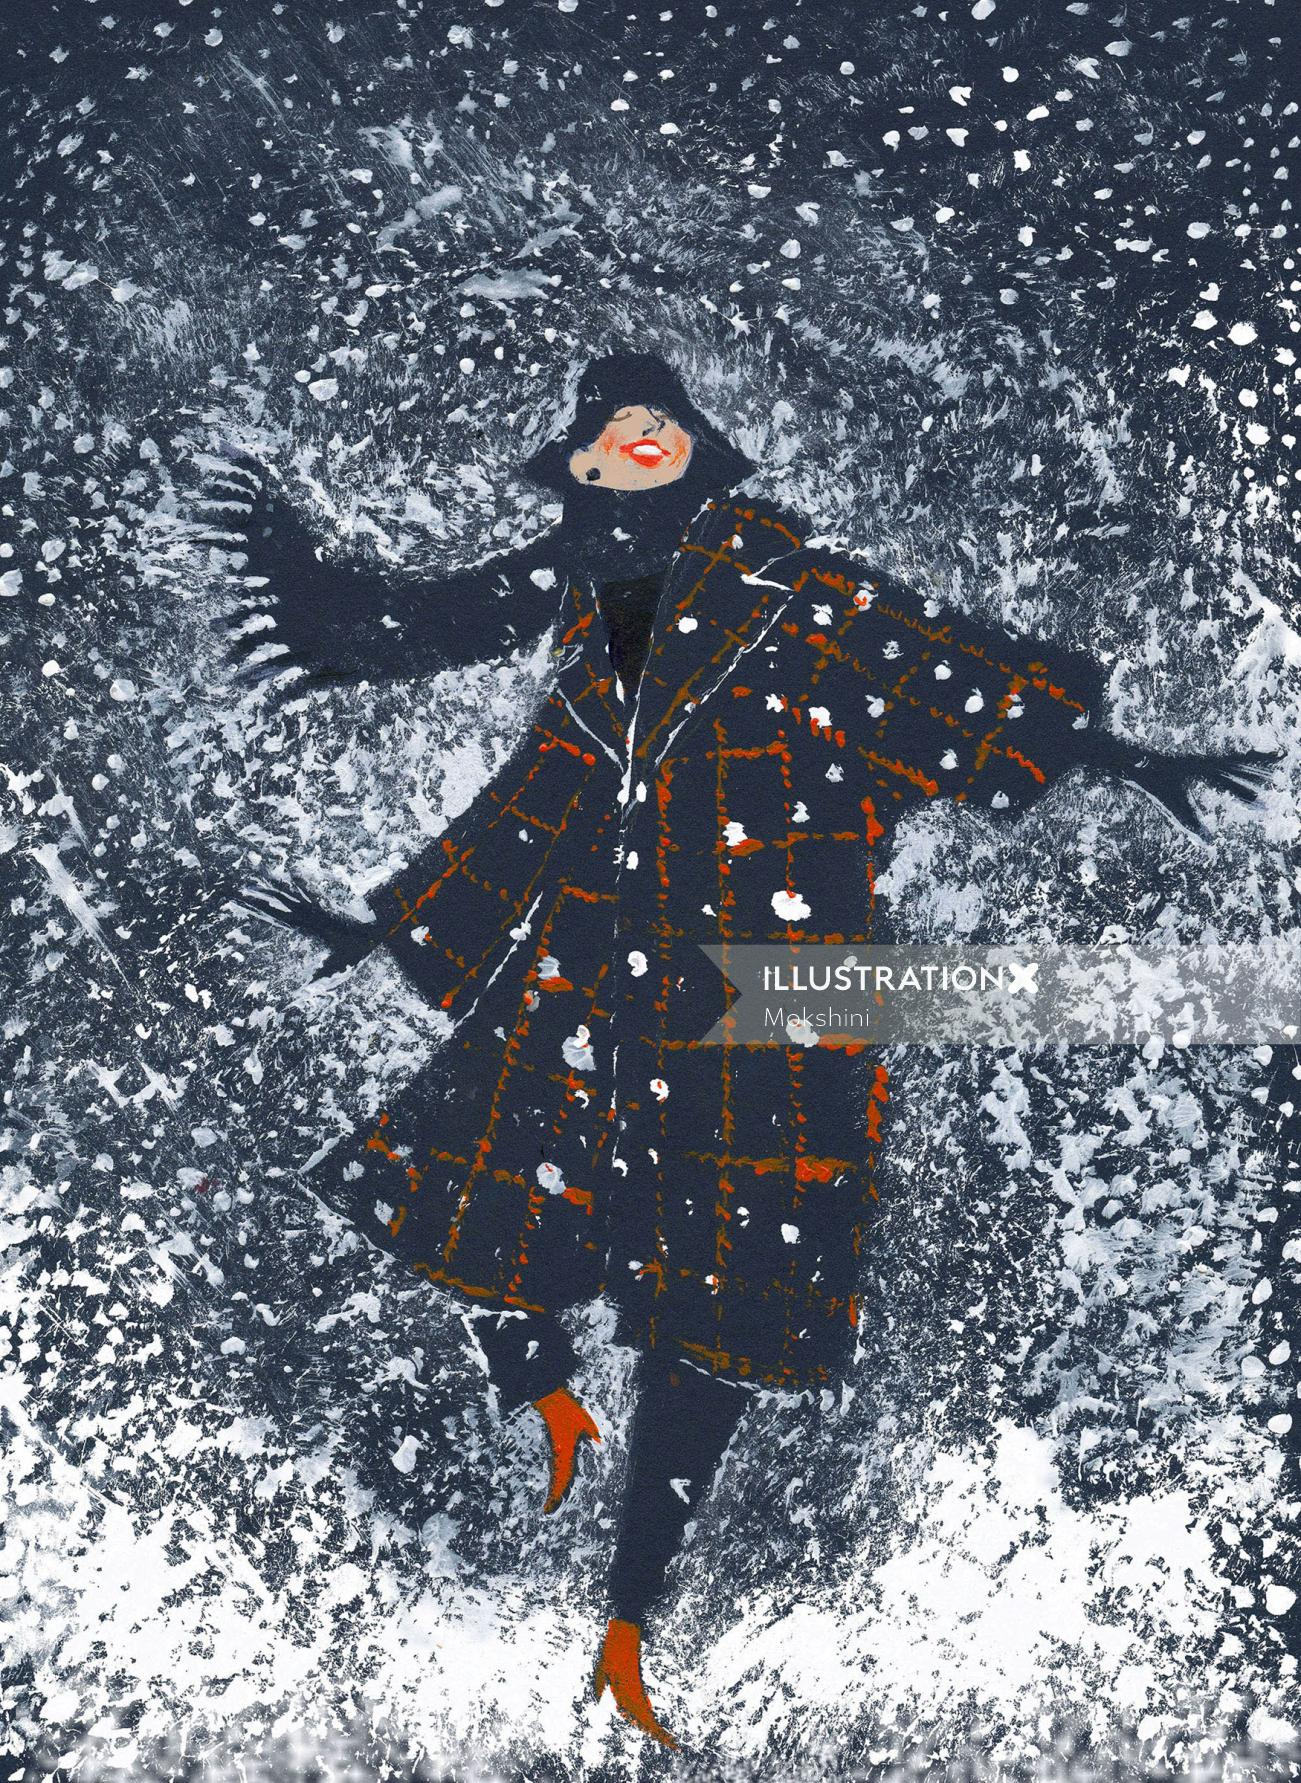 Illustration of it's snowing